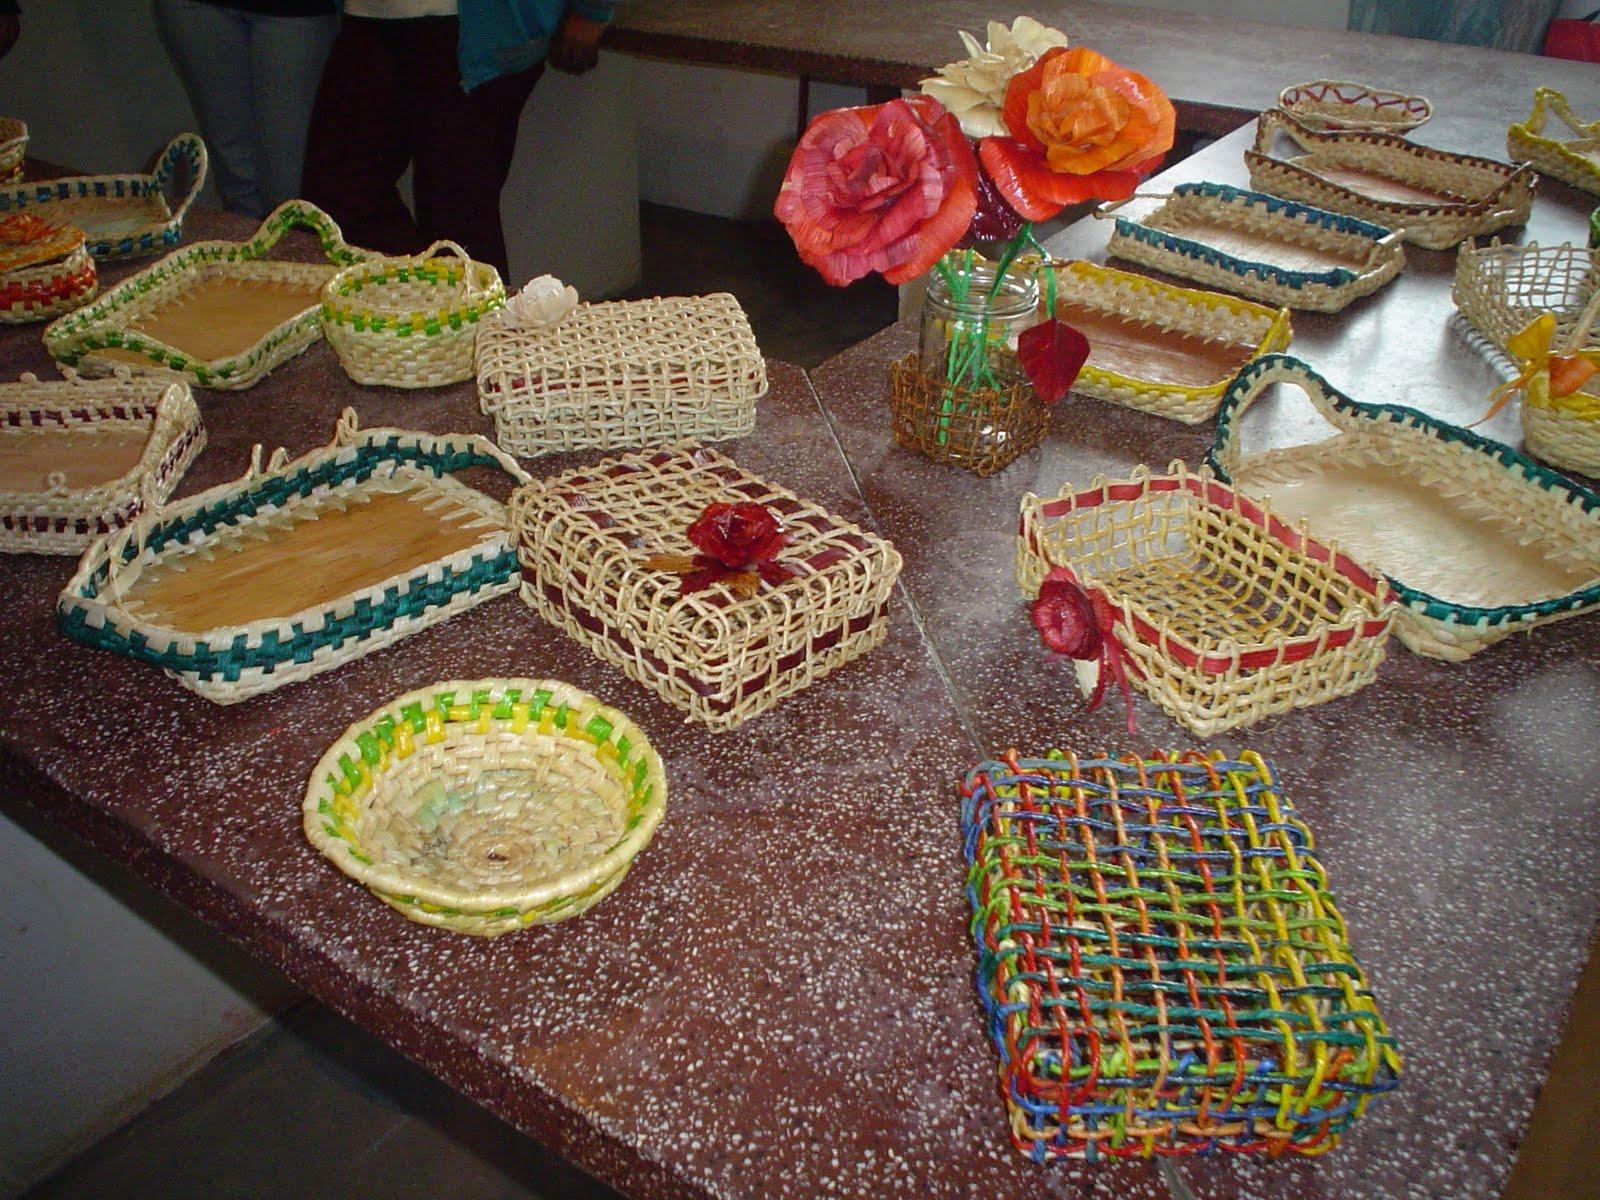 Território Adentro Artesanato transforma palha de milho